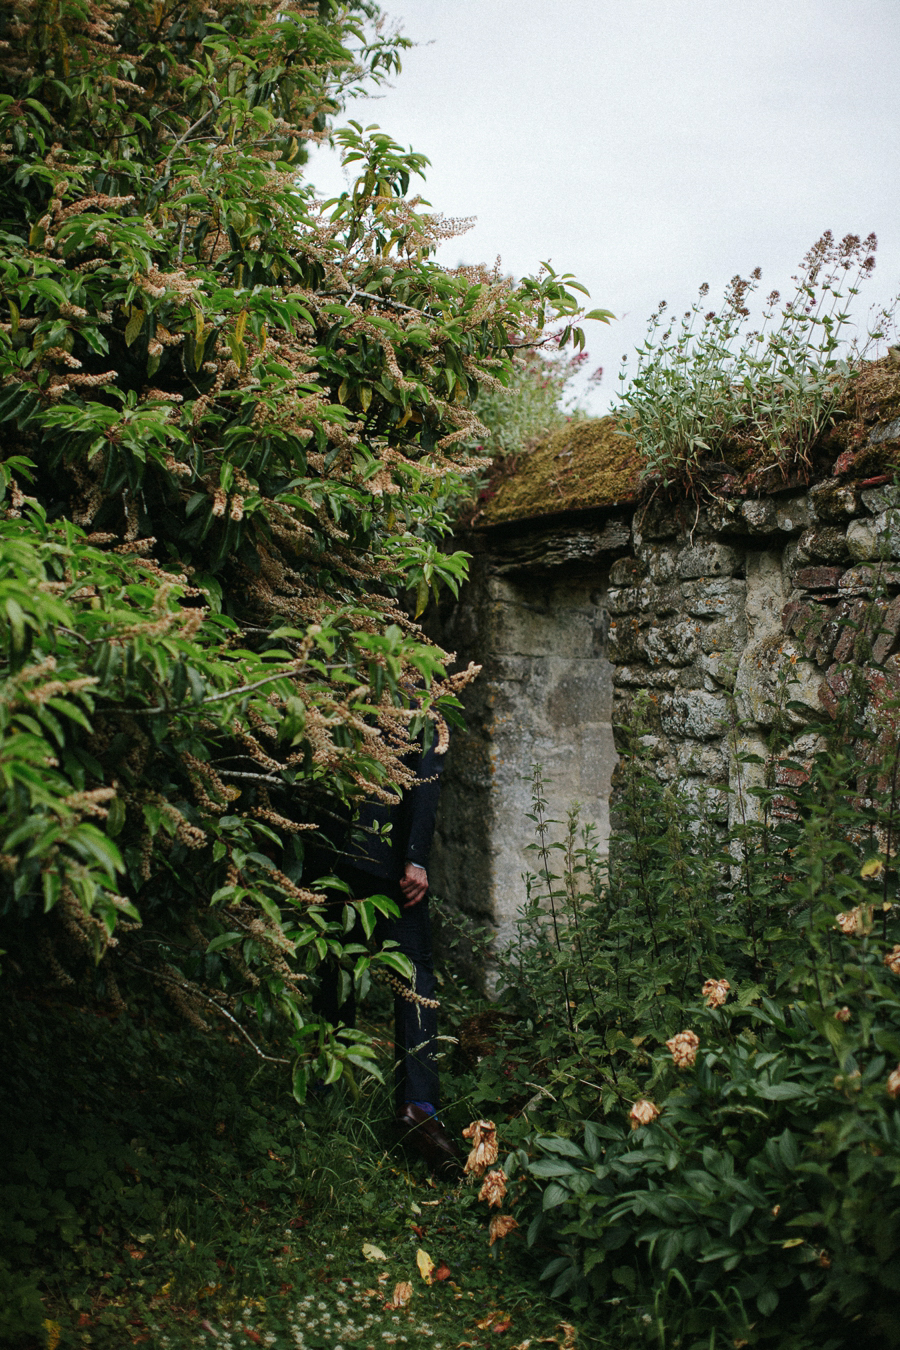 Notley-abbey-buckinghamshire-england-wedding-abi-q-photography--170.jpg